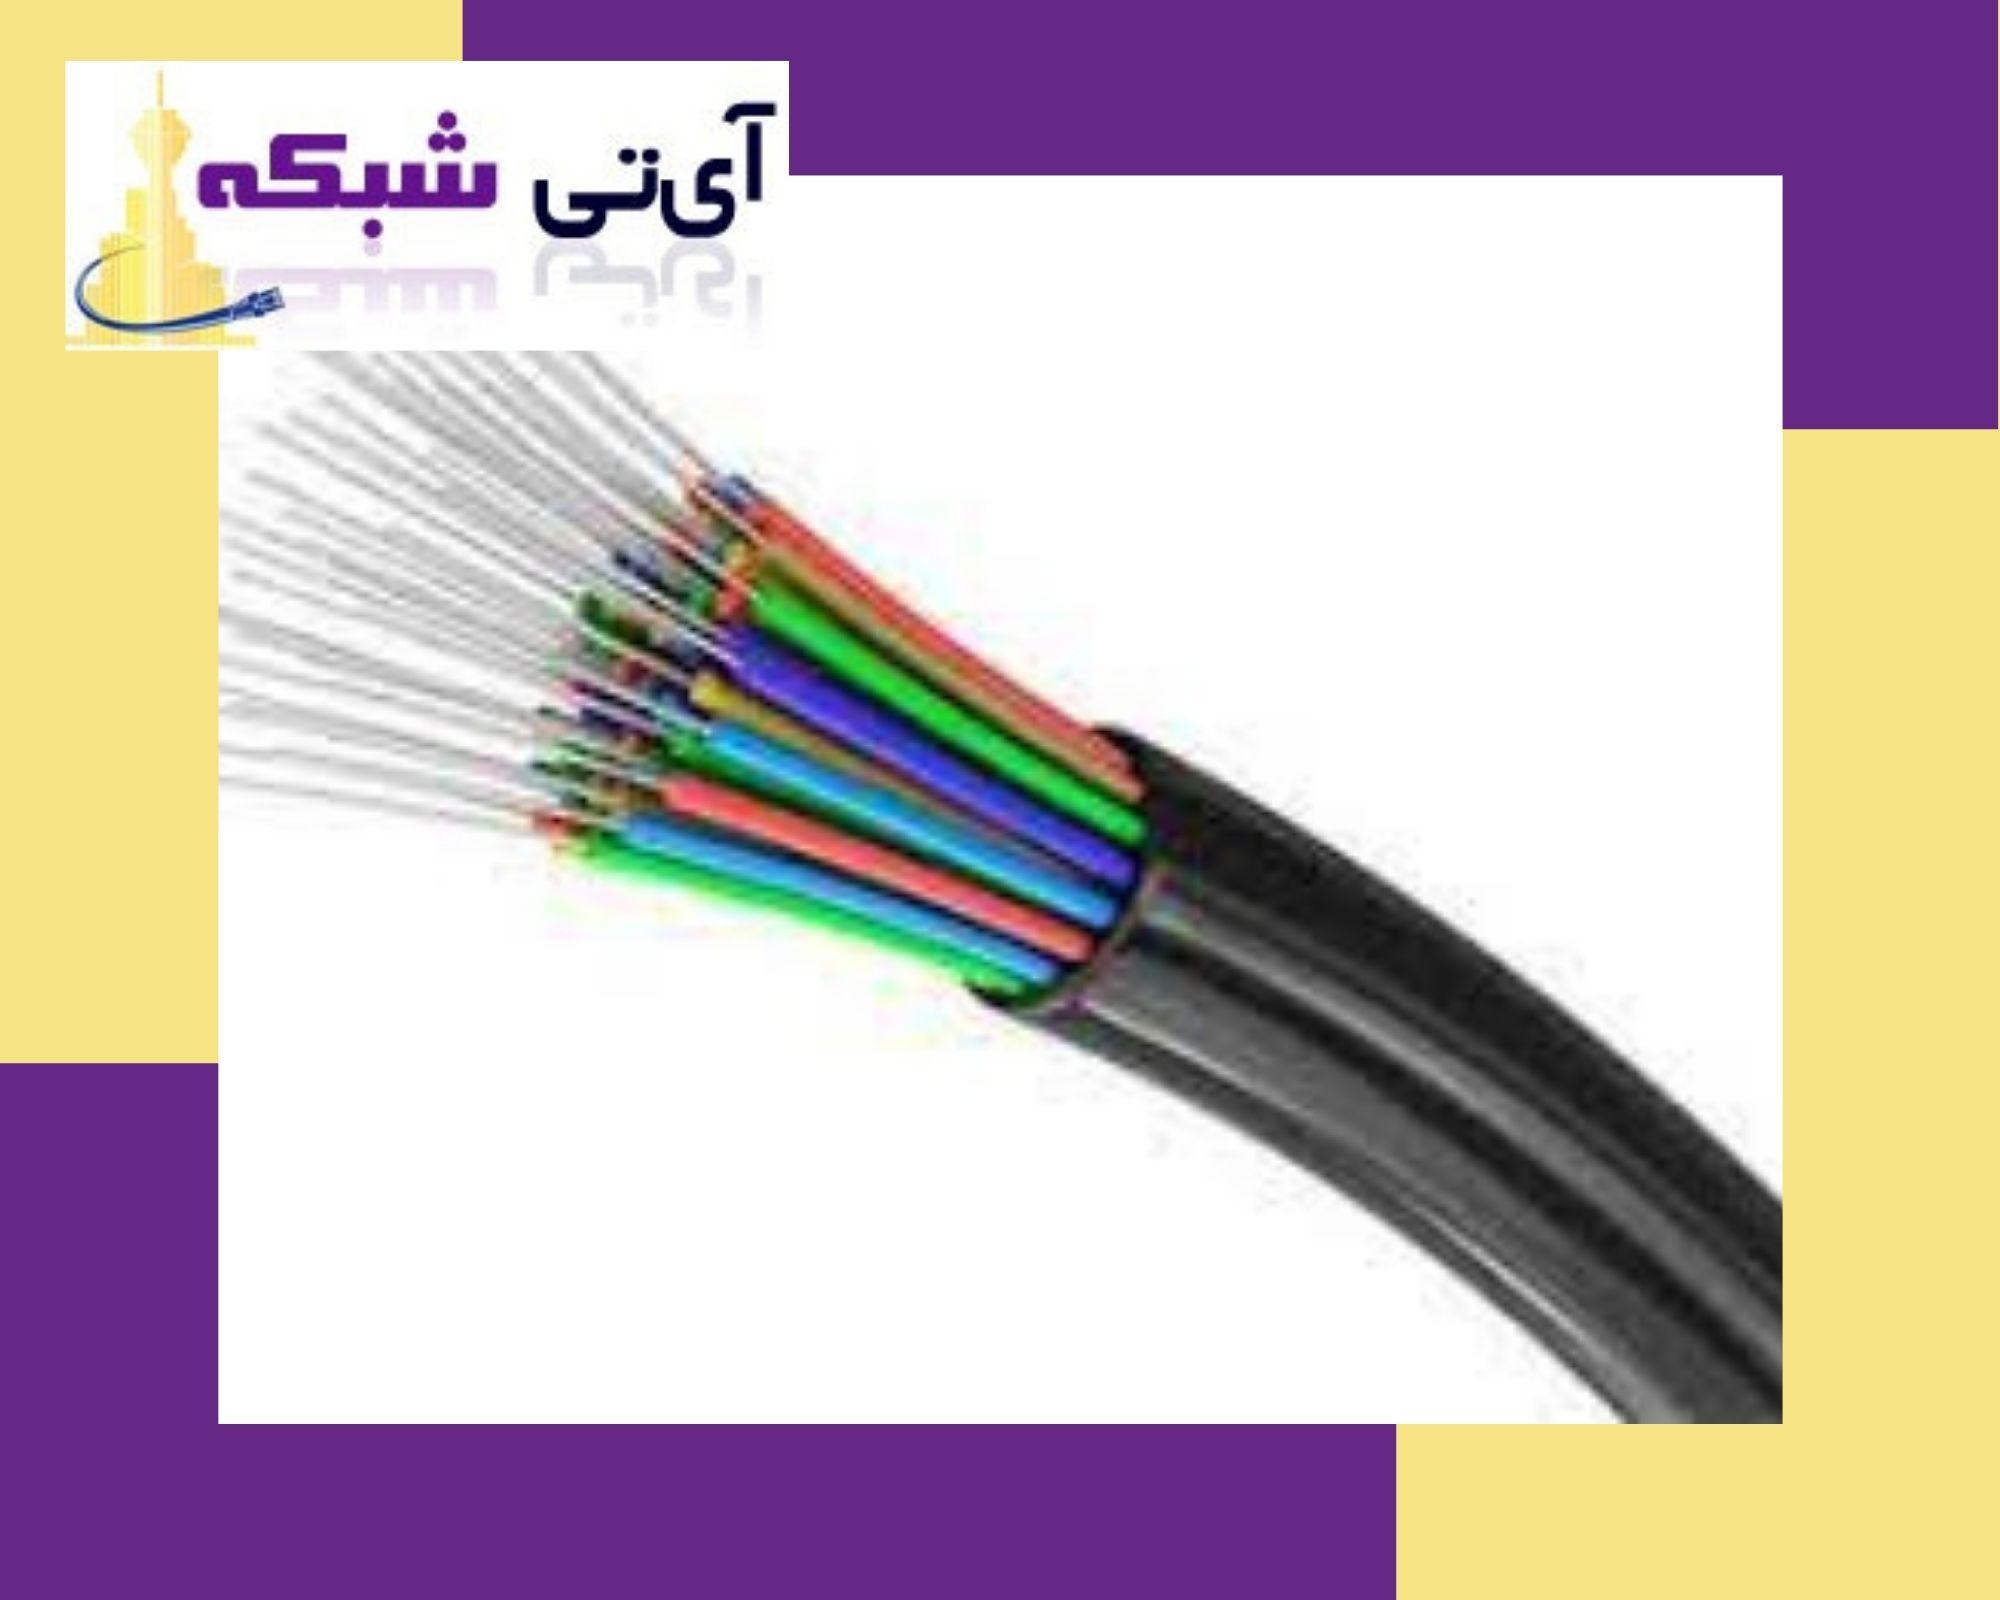 قیمت- کابل - فیبر - نوری - ای تی - شبکه